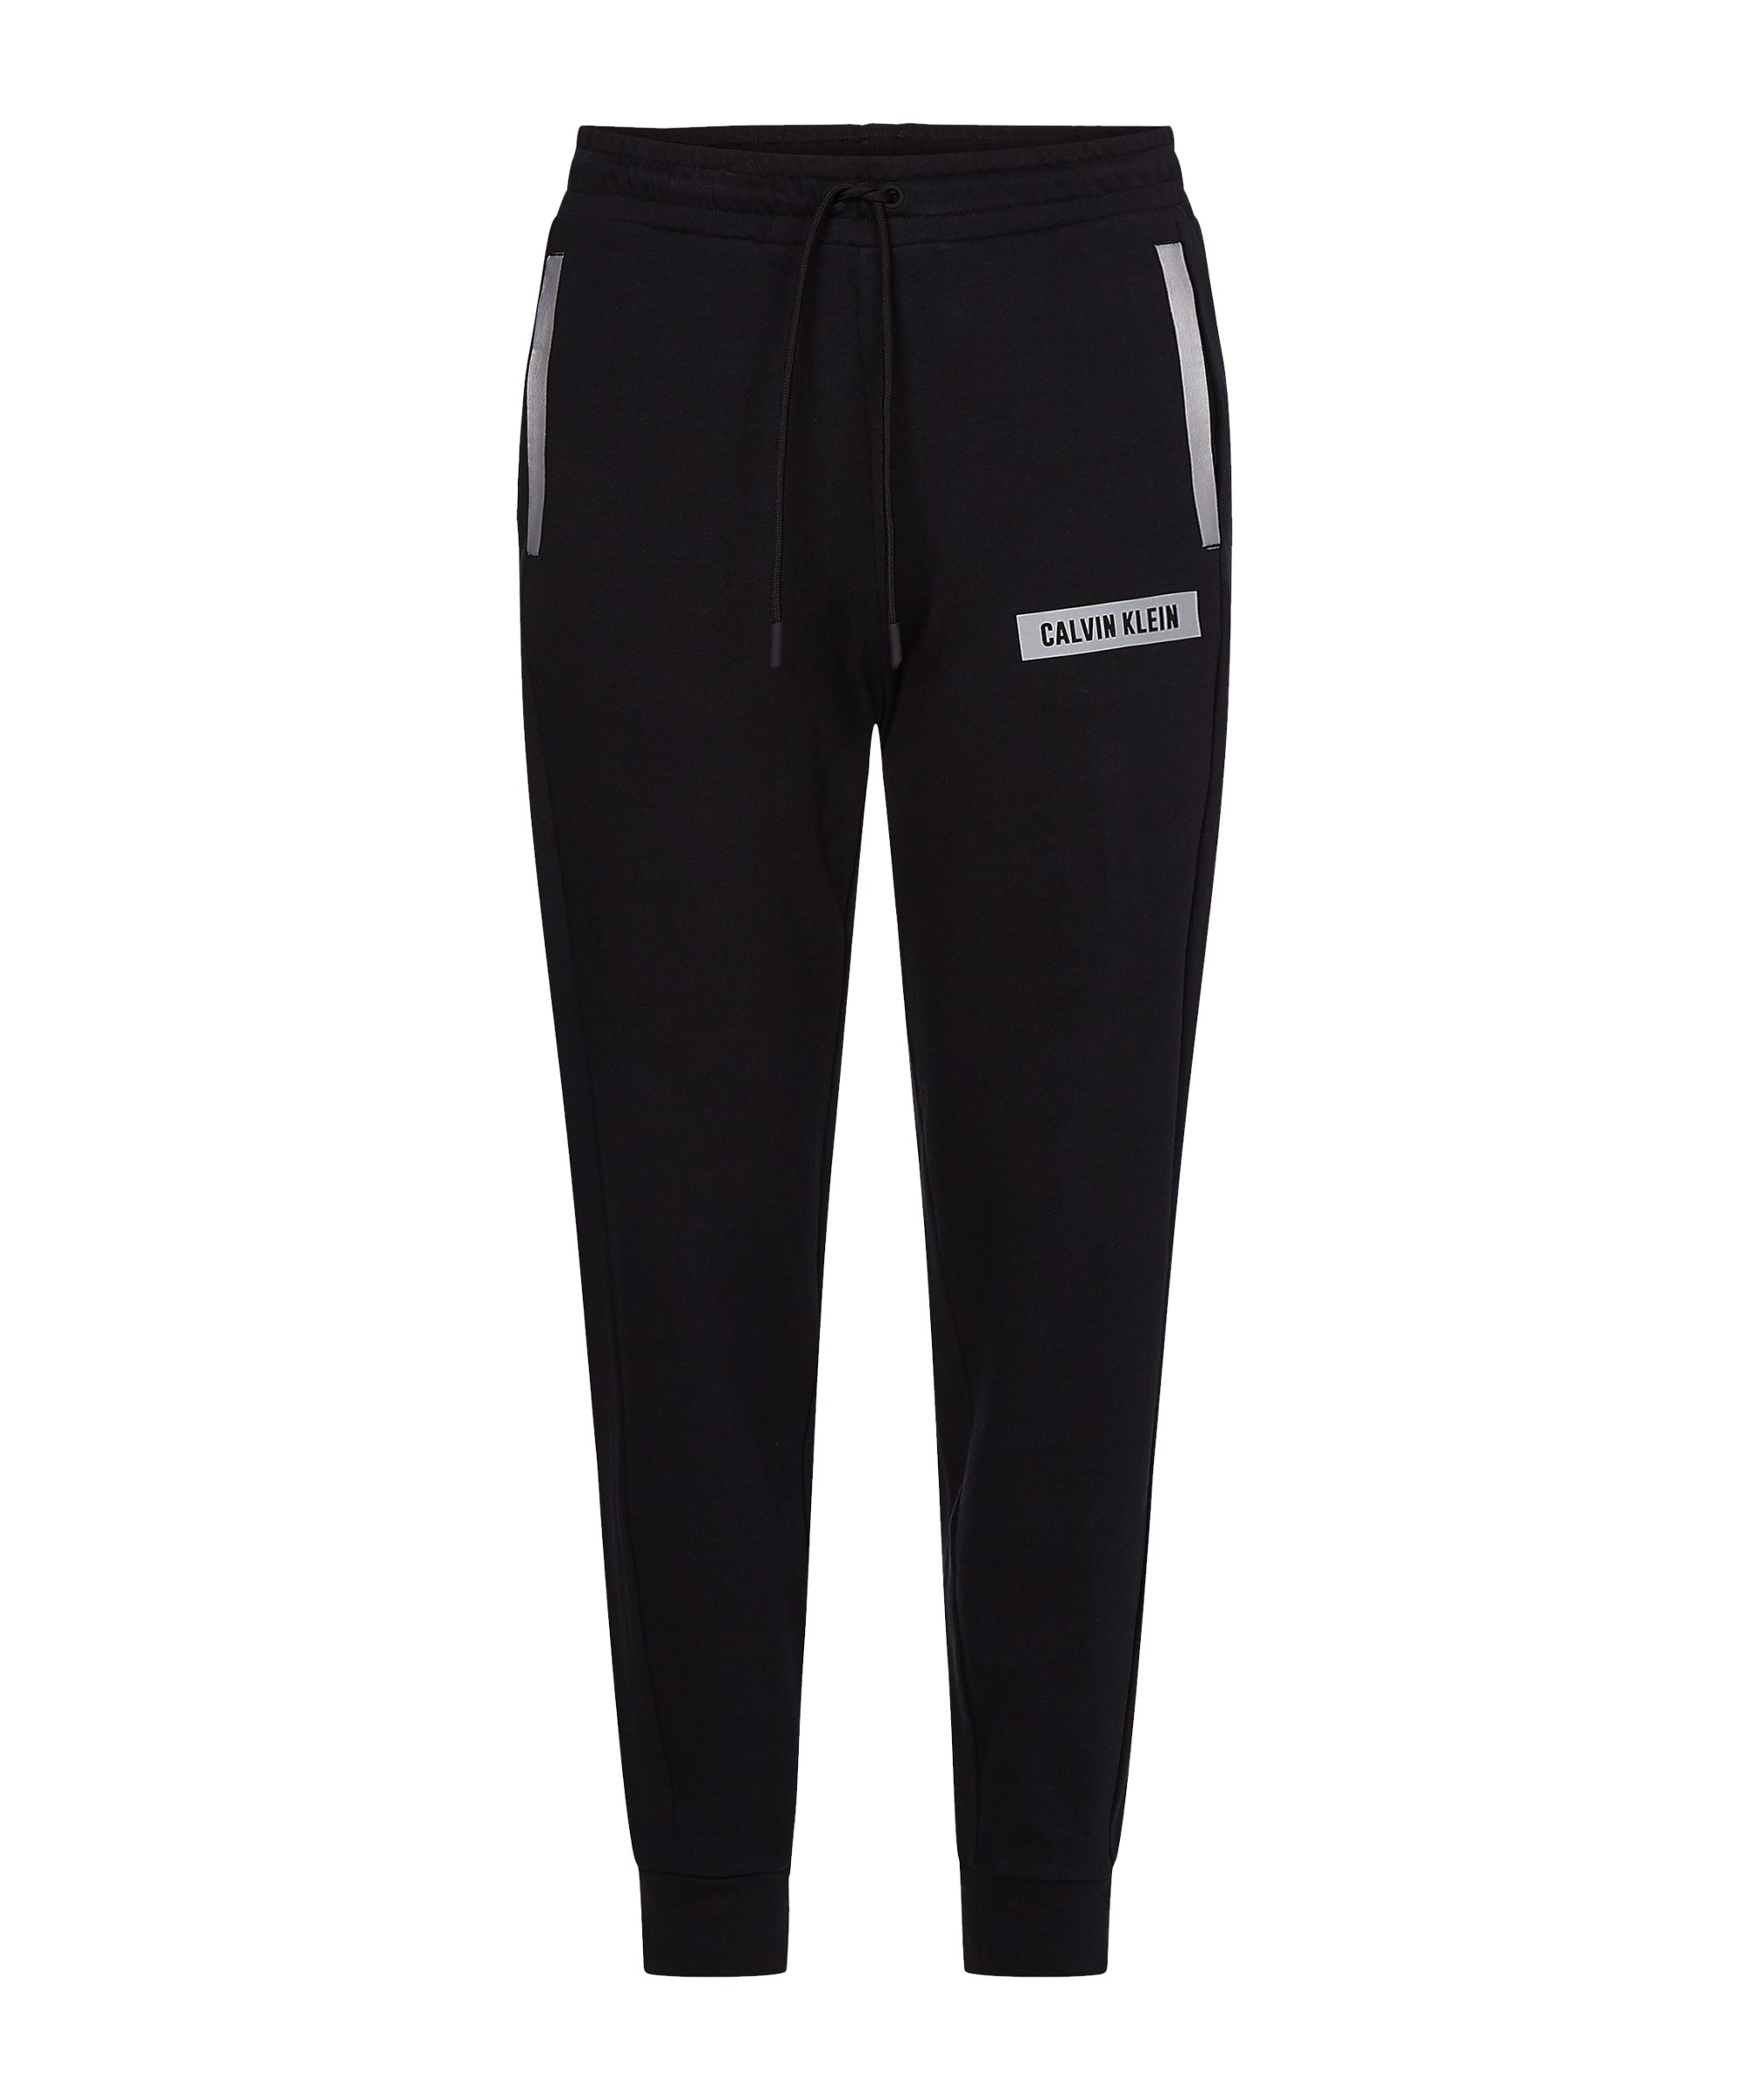 Calvin Klein Knit Jogginghose Damen Schwarz F007 - schwarz